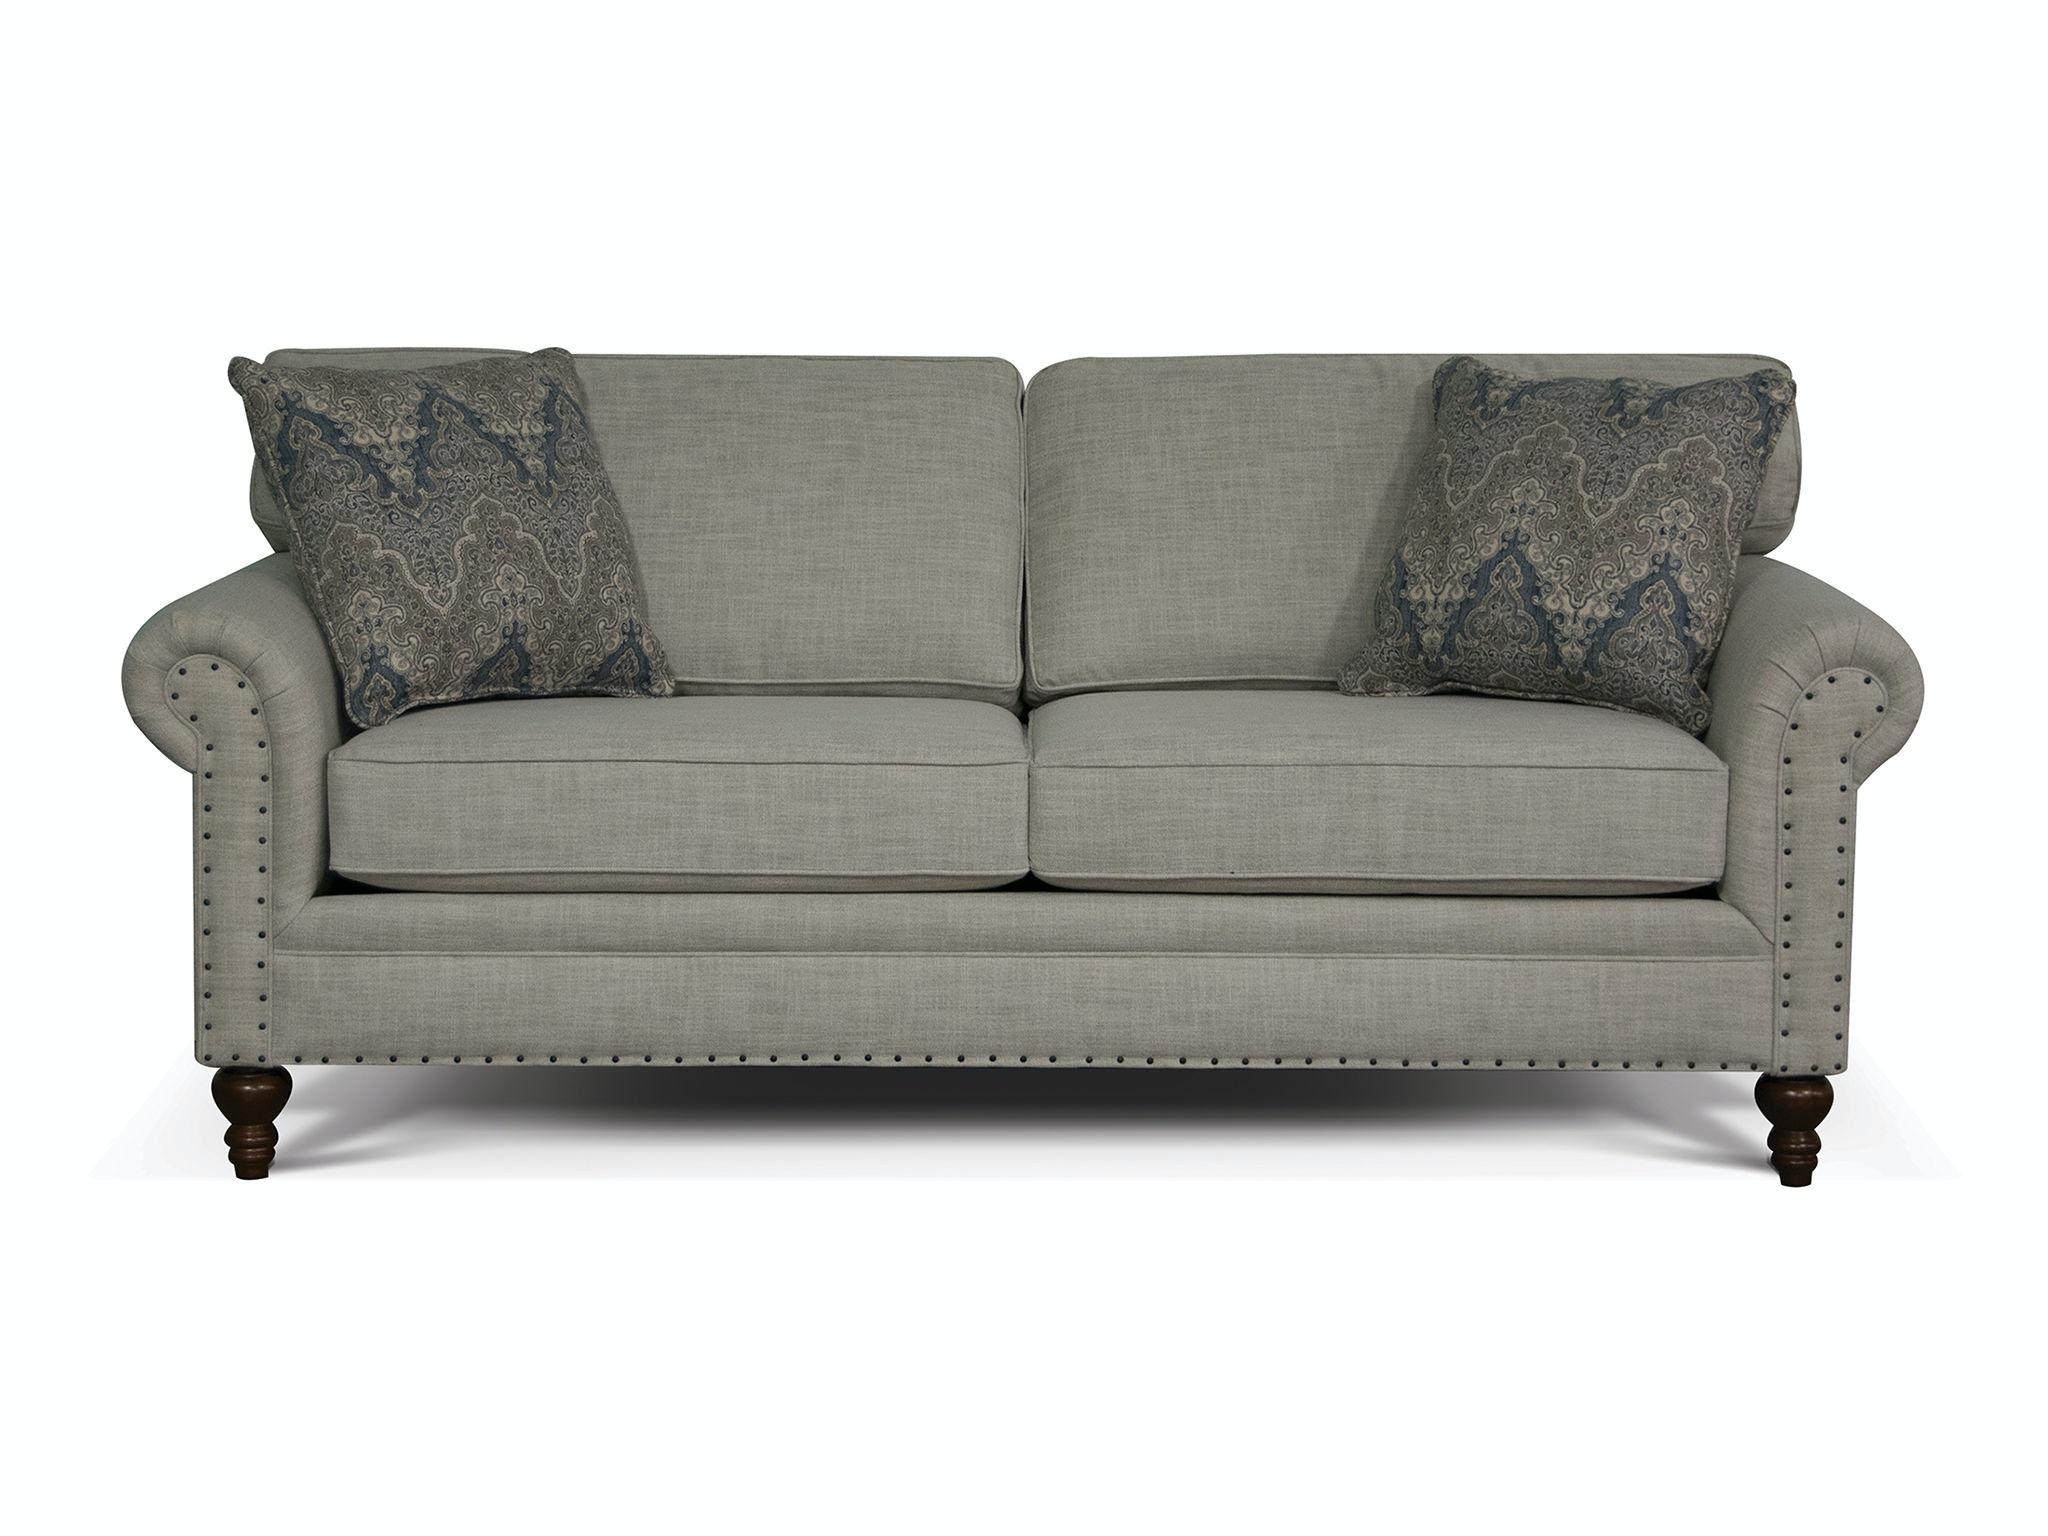 England Living Room Renea Sofa With Nails